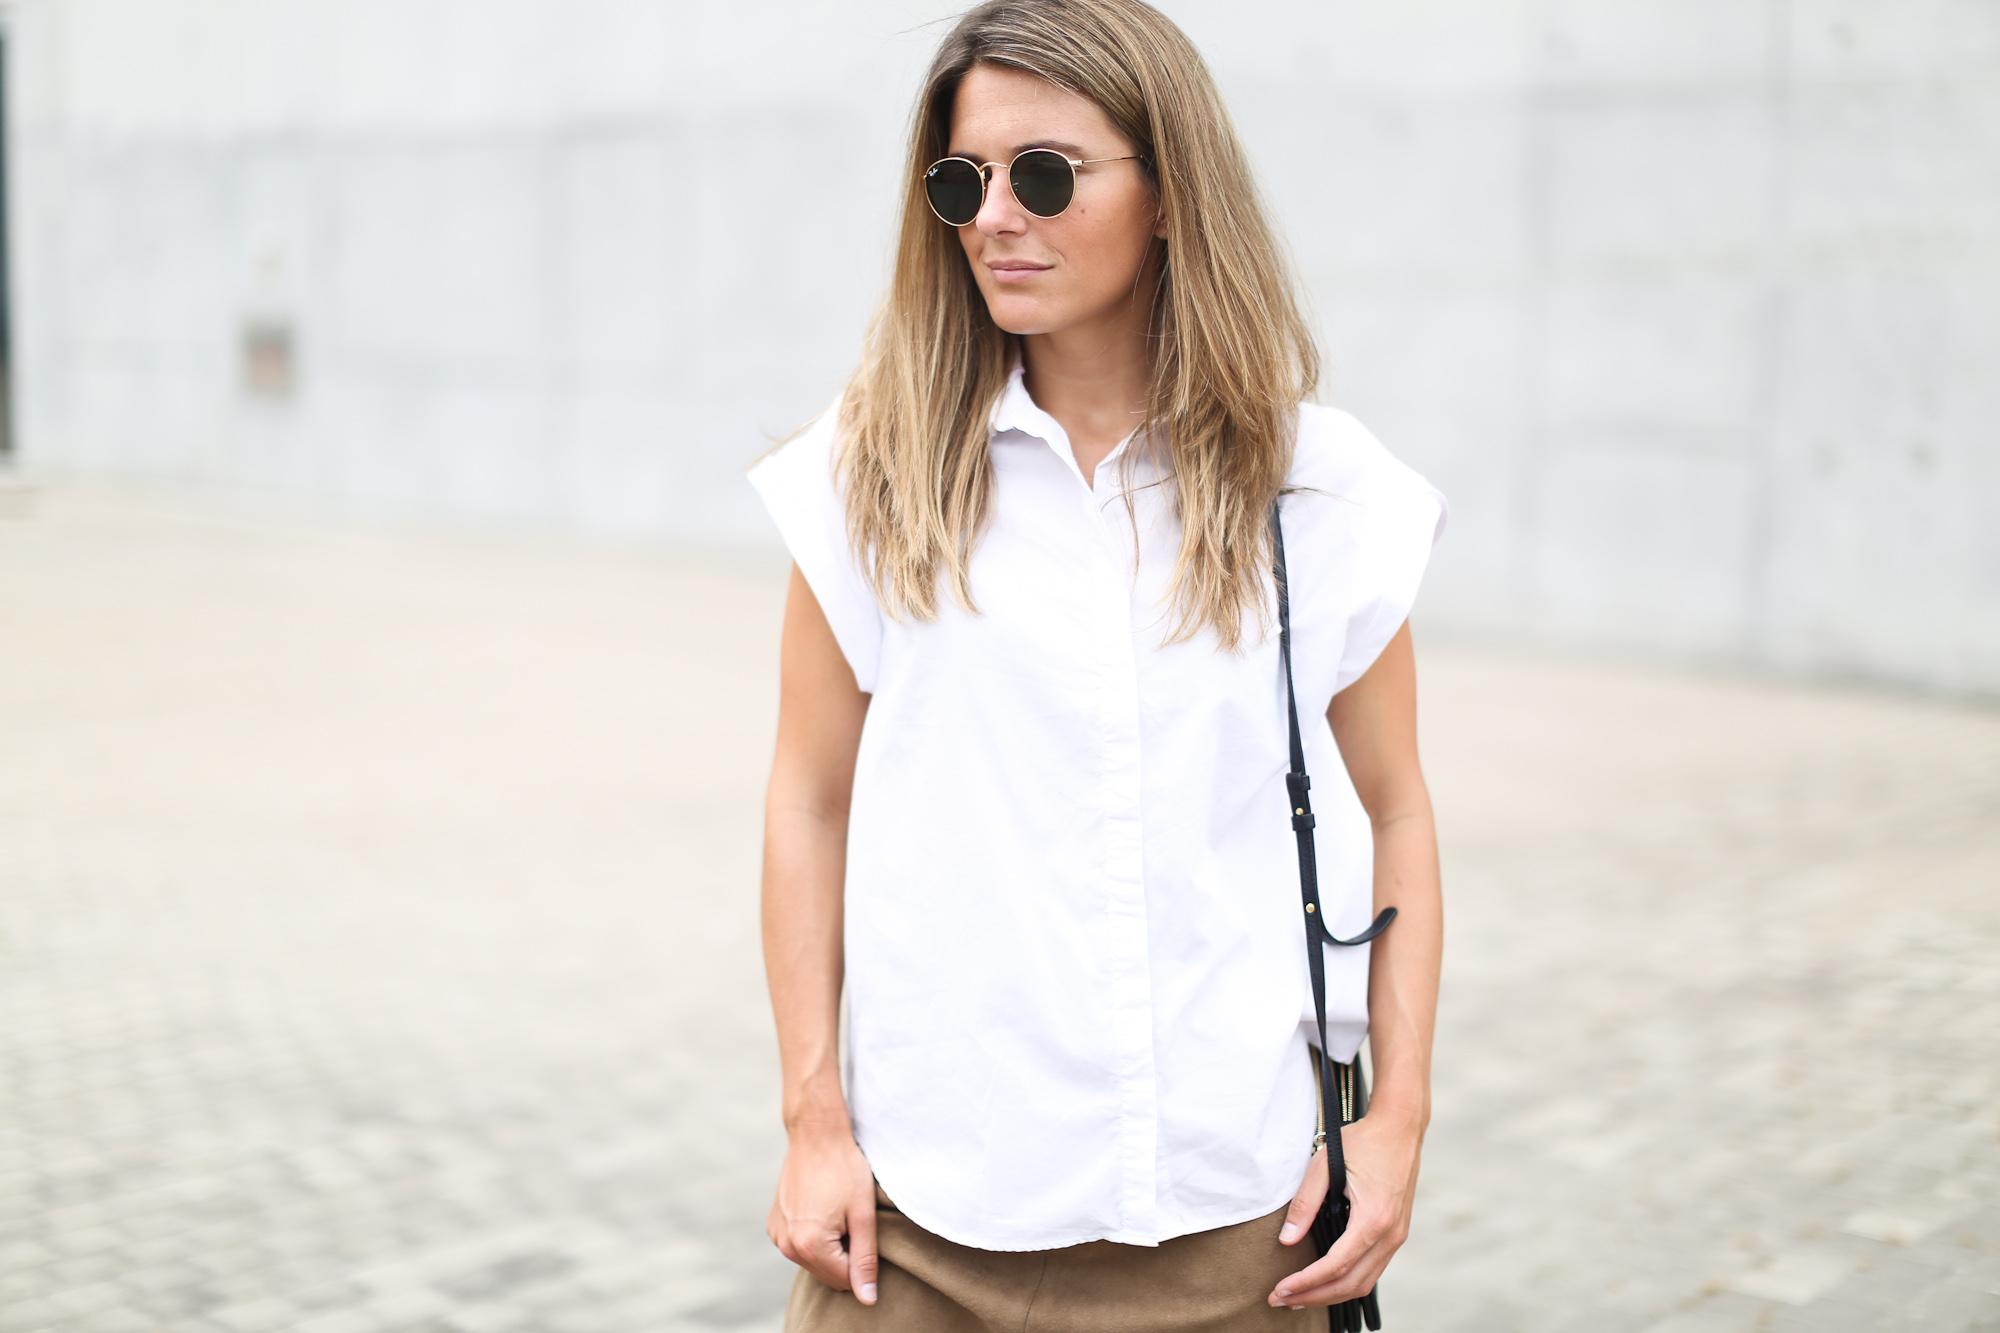 Clochet_suede_skirt_white_shirt_adidas_stan_smith_leztinstreet_celine_trio_bag-6